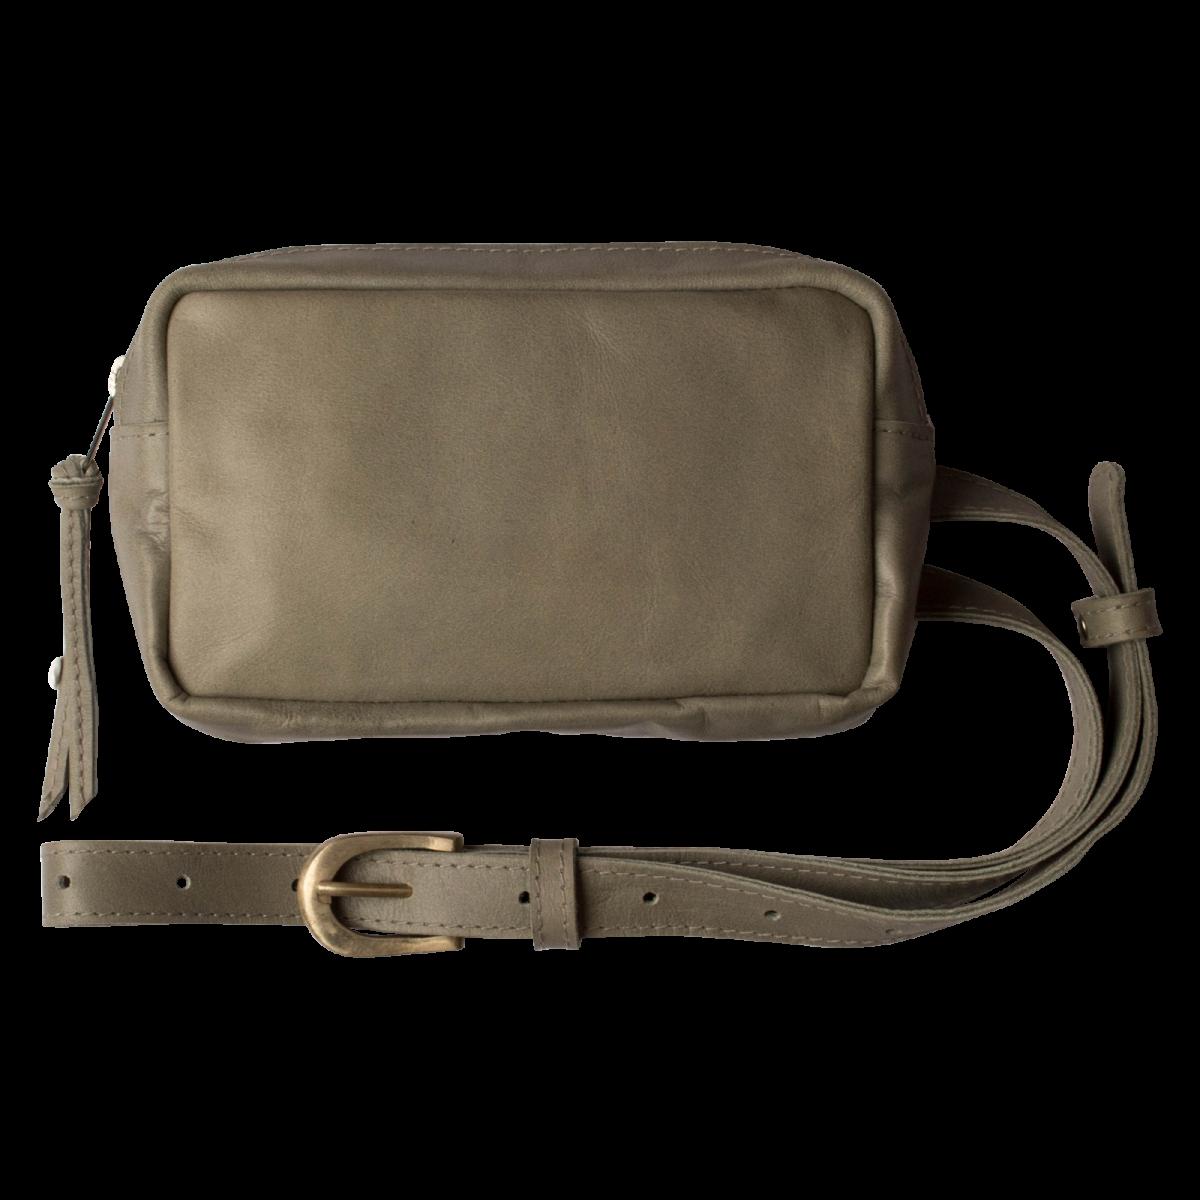 Small Travel Bag Women